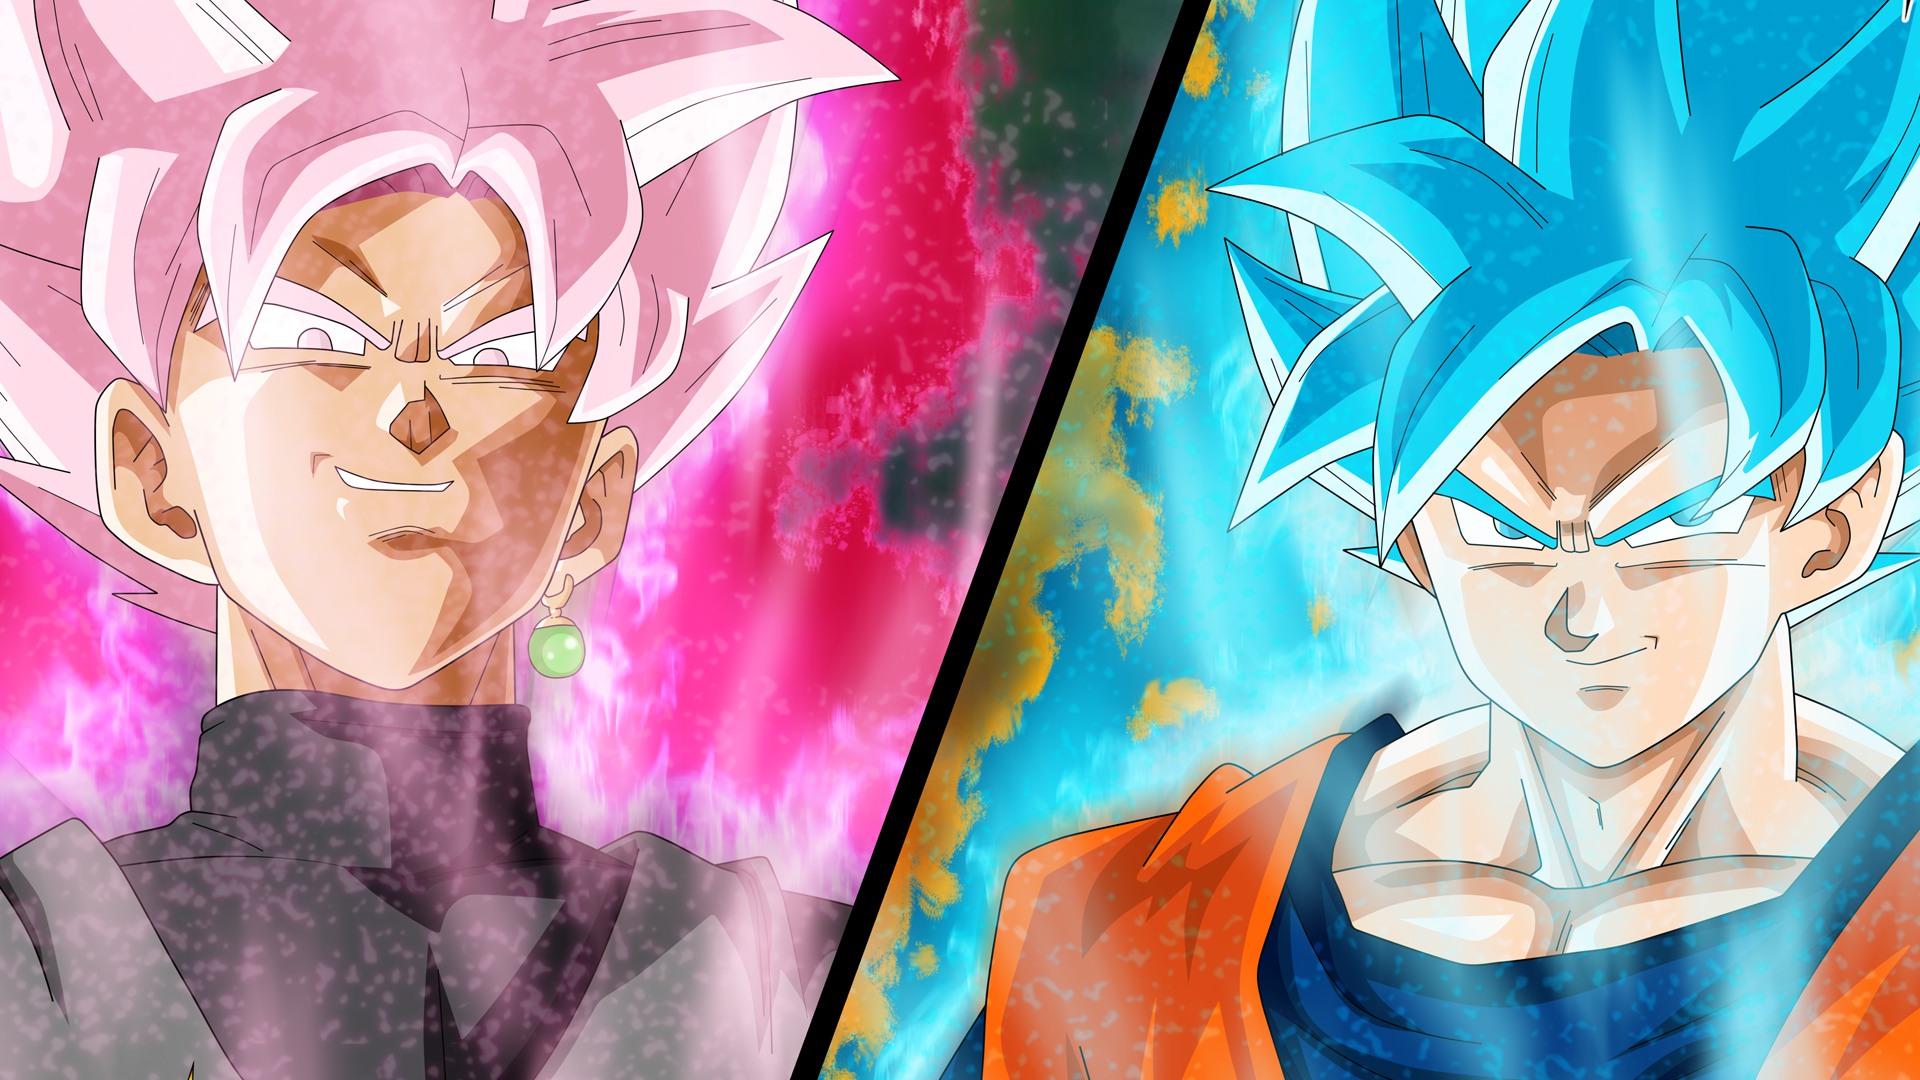 Dragon Ball Super Goku And Black Goku Hd Wallpaper Background